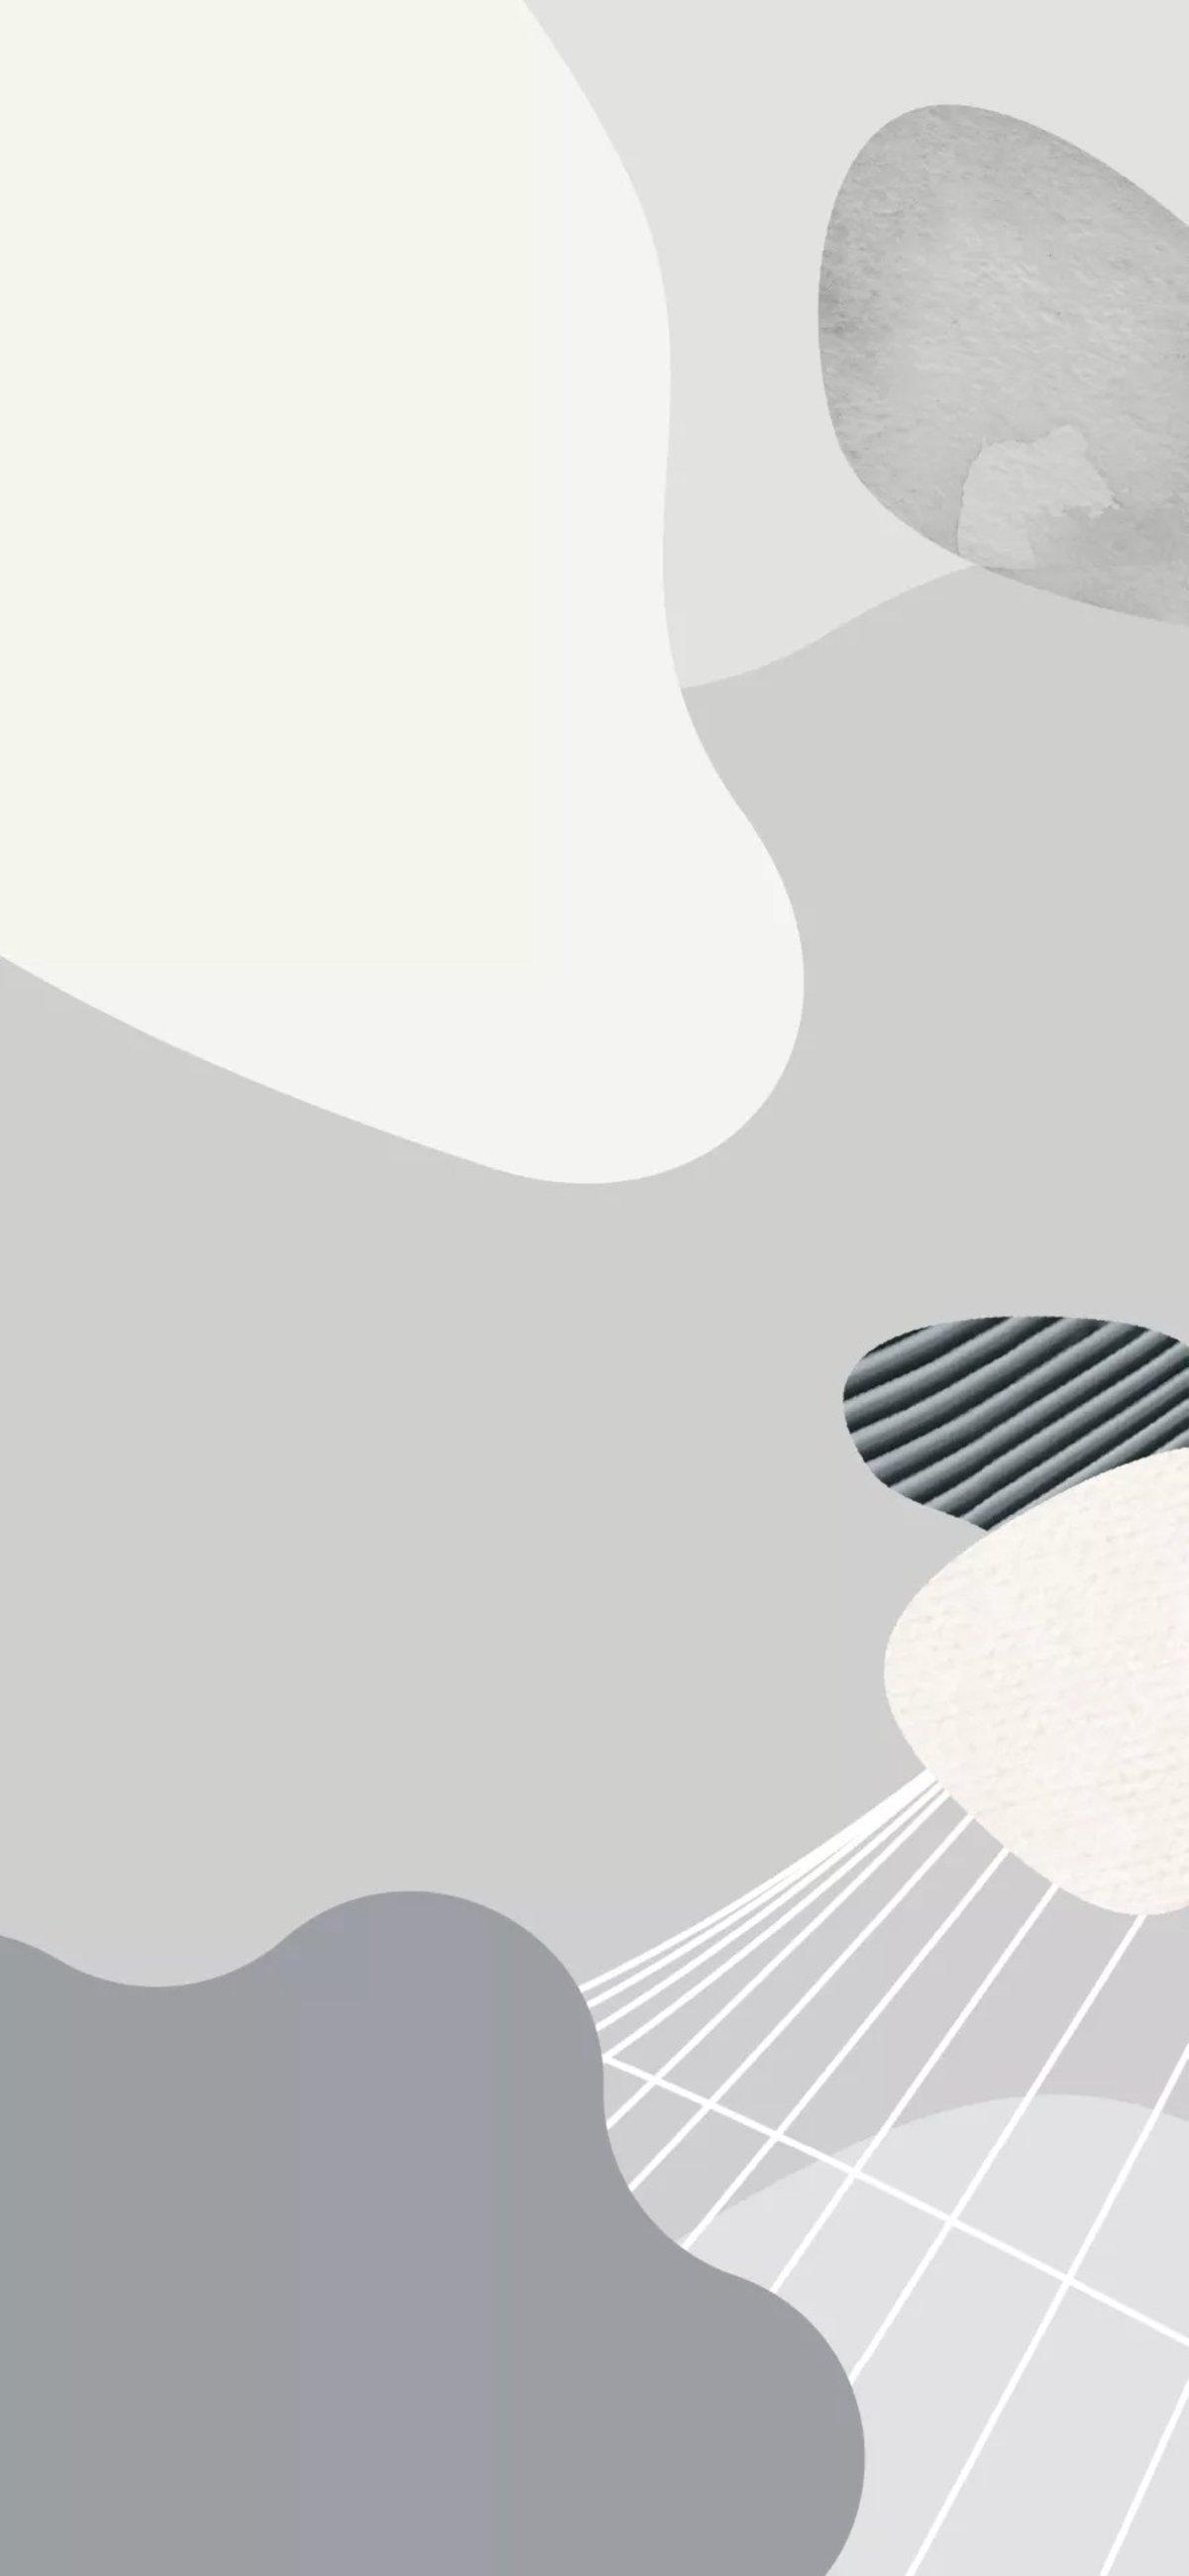 Download More New Google Pixel 6 Wallpapers